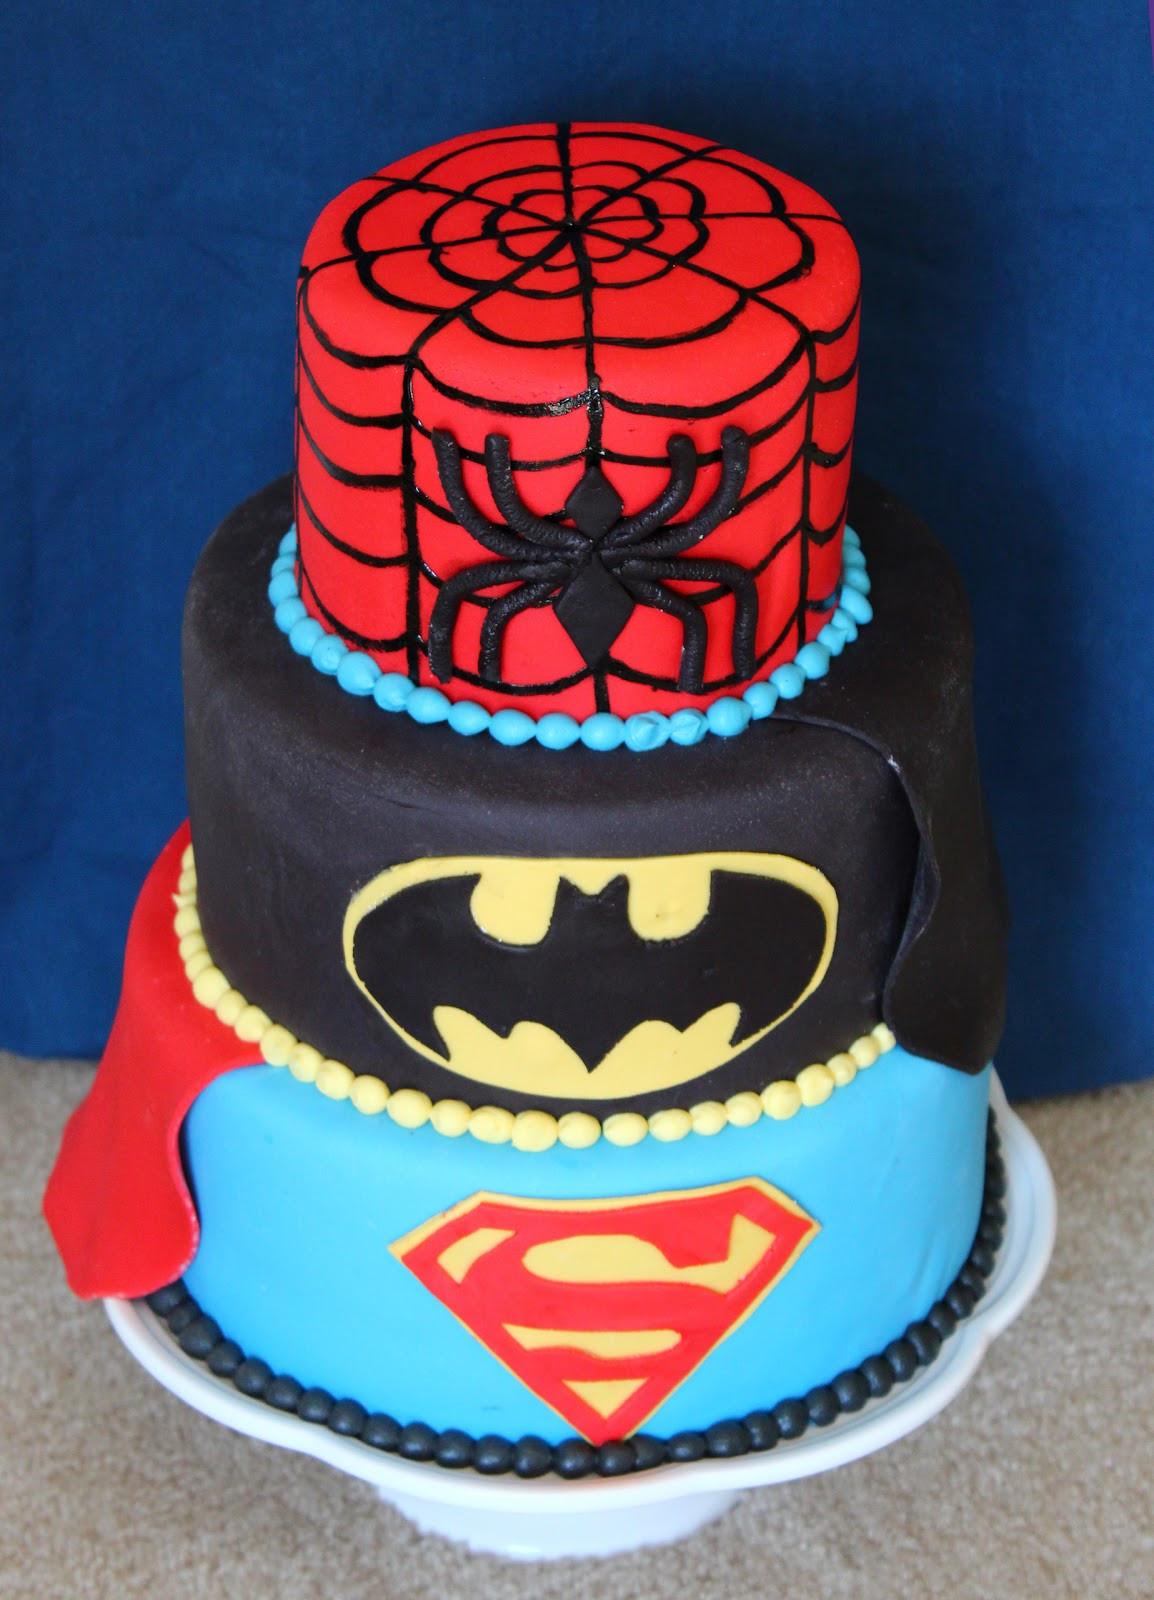 Best ideas about Superhero Birthday Cake . Save or Pin Cake Flair Superhero Cake Now.